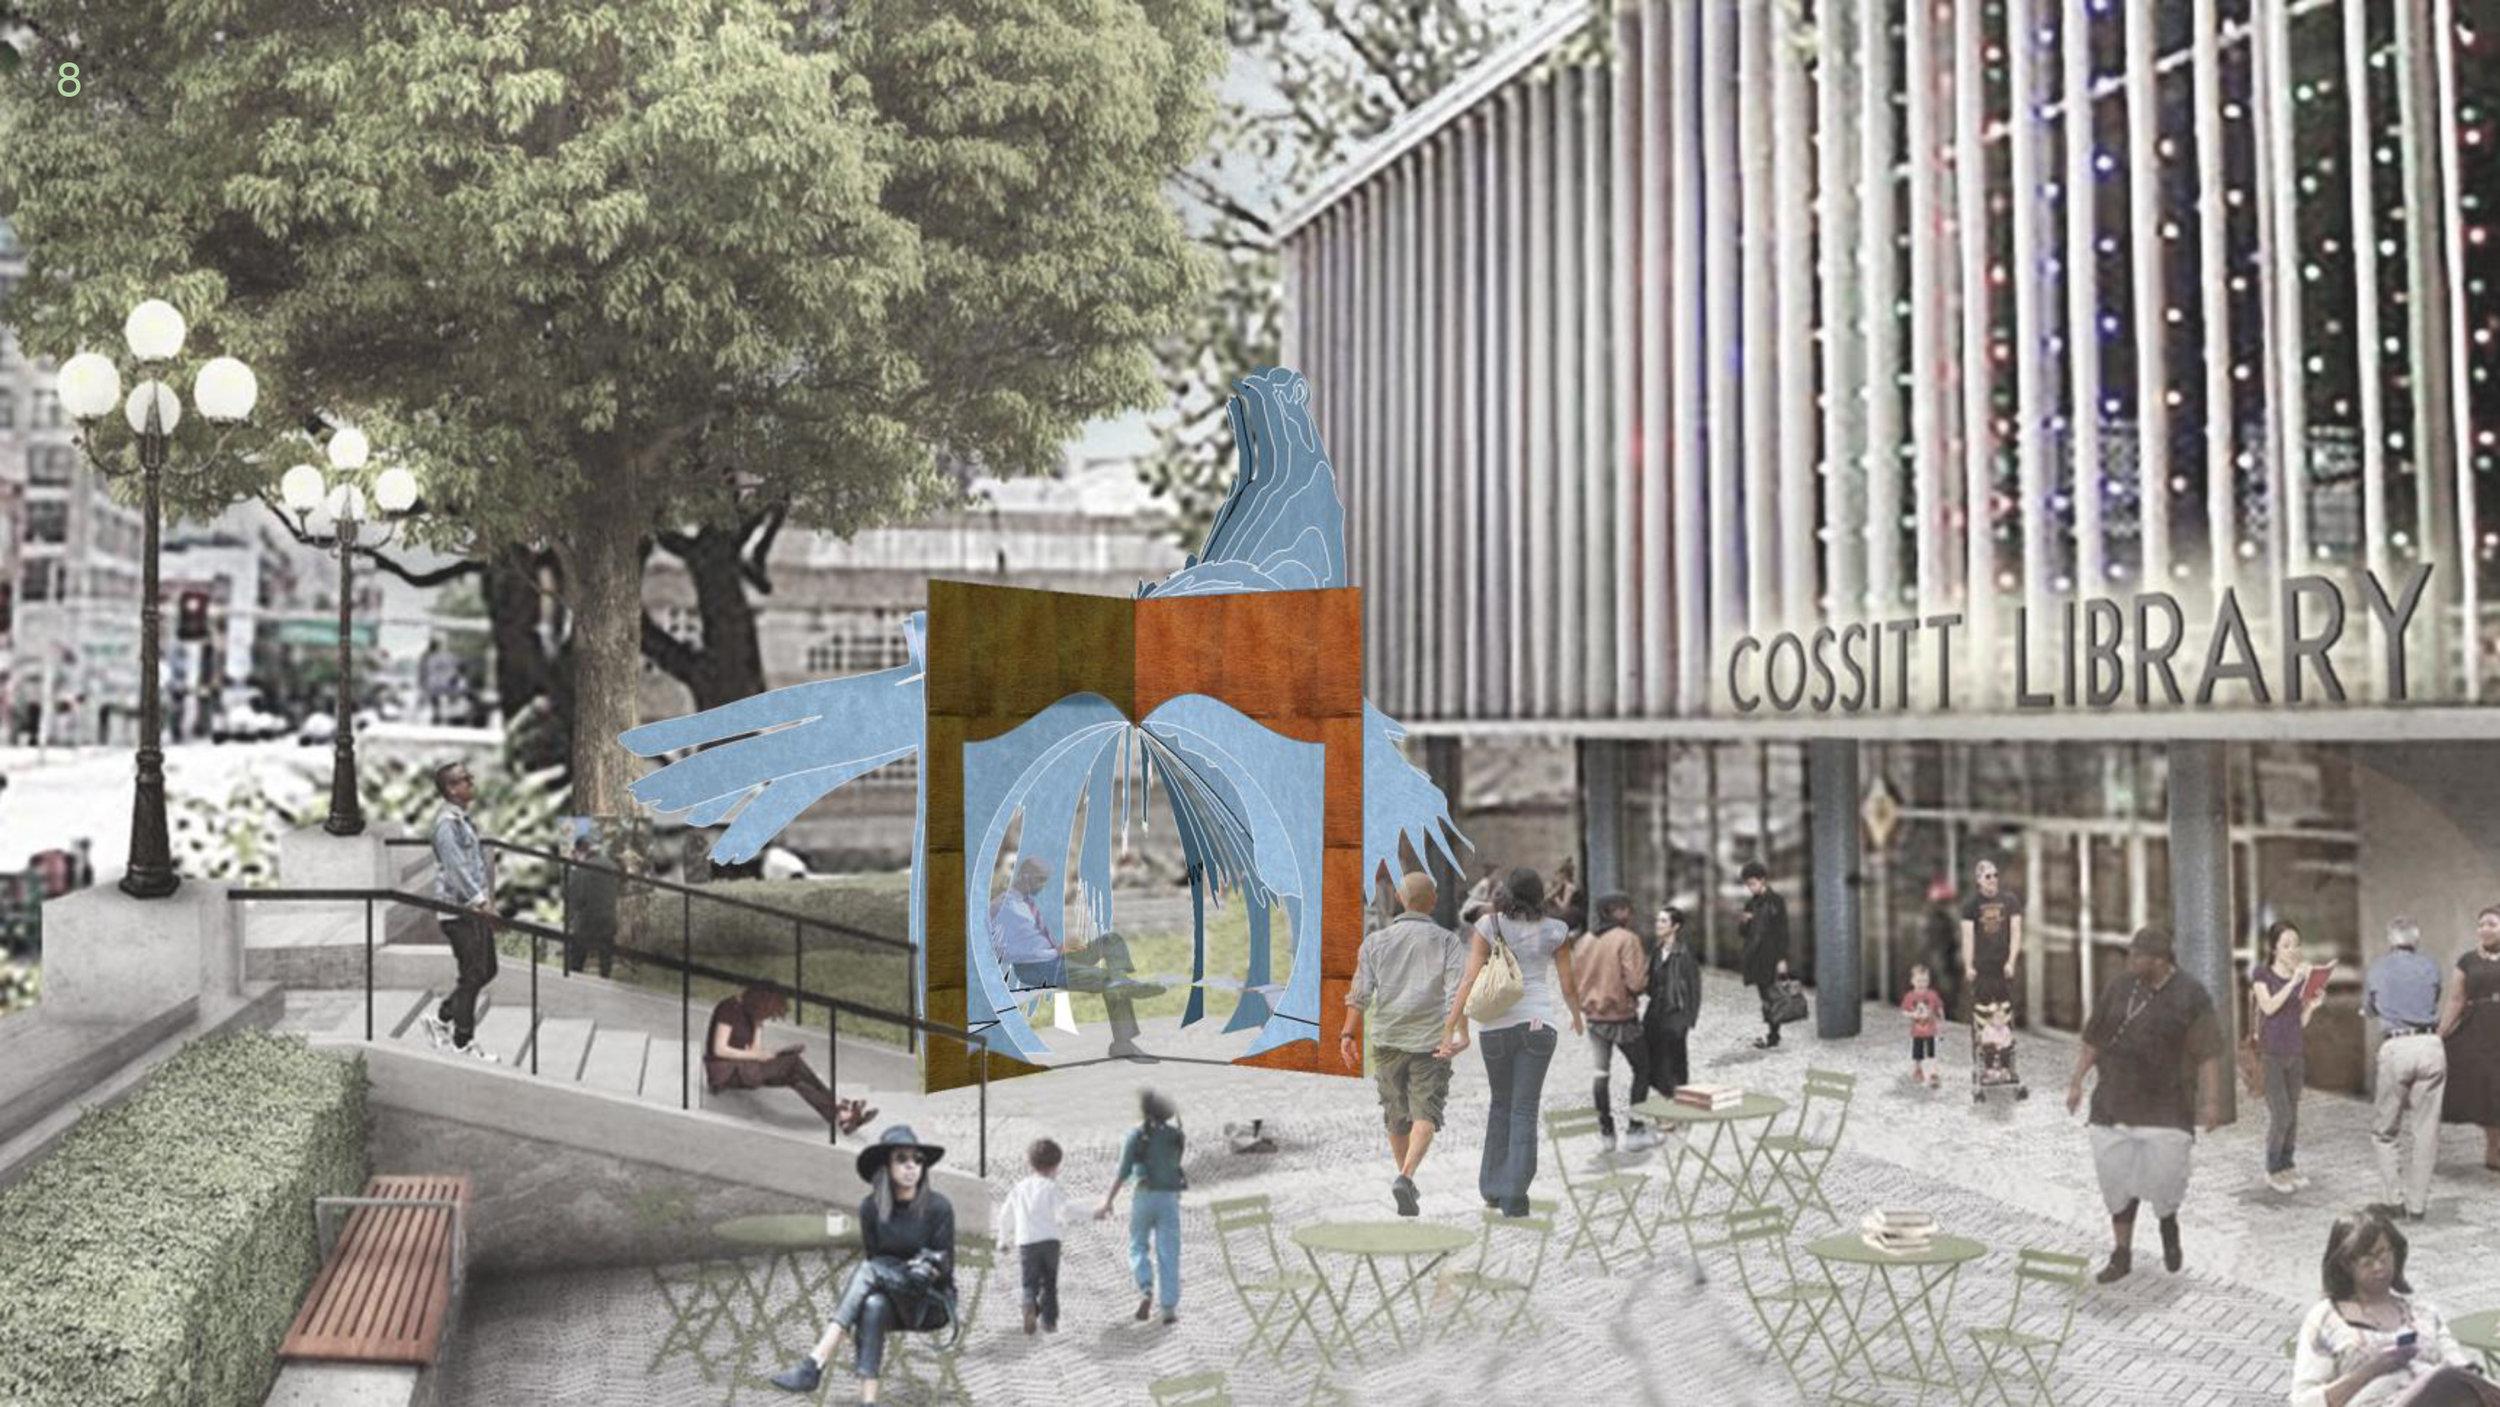 proposed sculpture design for Cossitt Library Sculpture